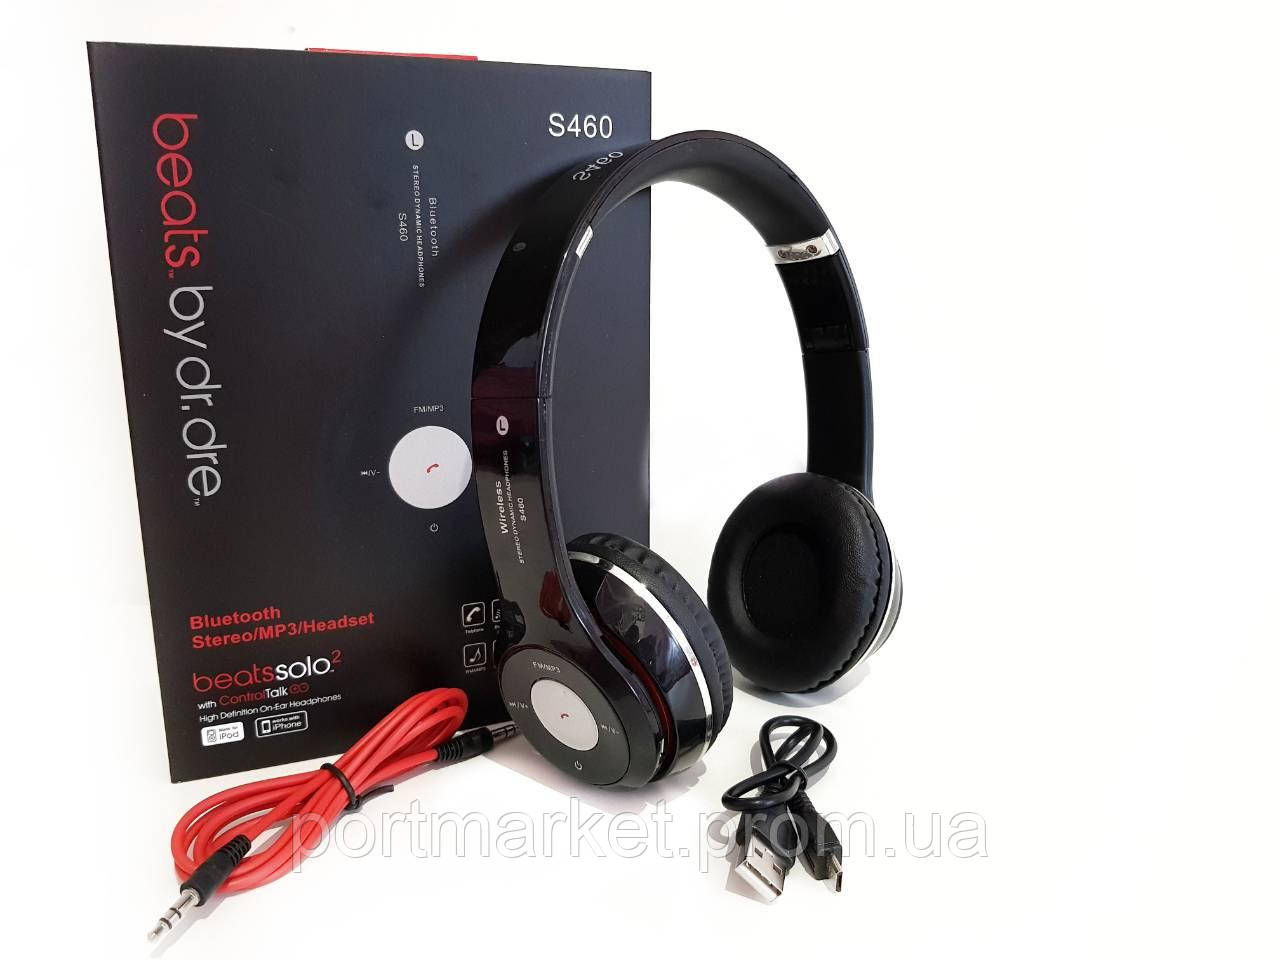 Наушники Monster Beats Studio S460 BT, MP3, FM Новинка!